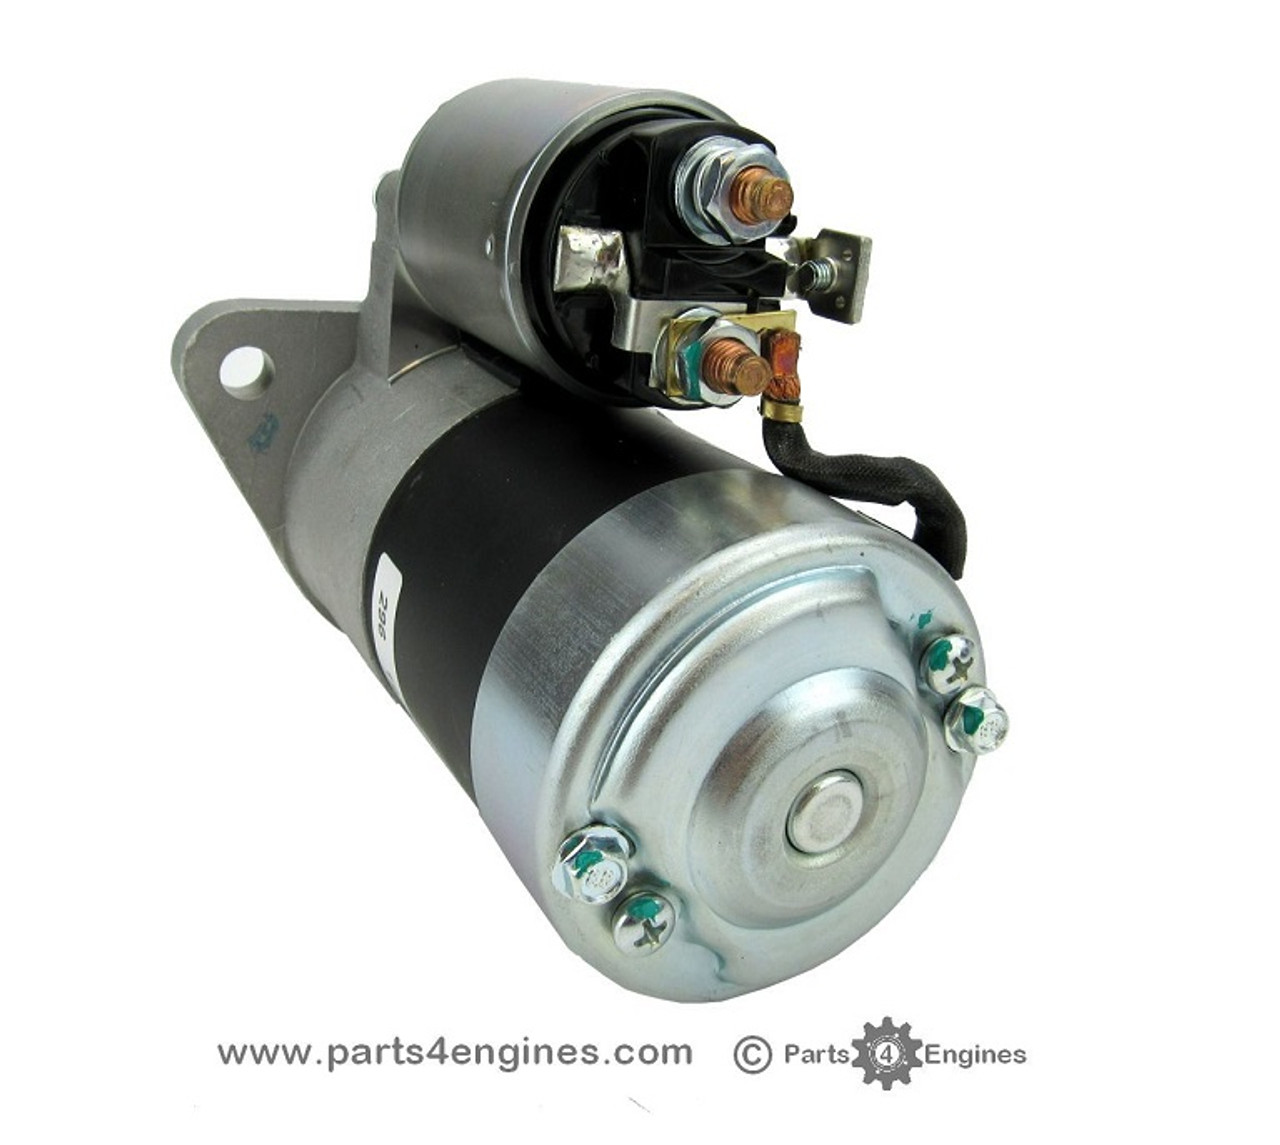 Yanmar 2GM20 Starter motor - parts4engines.com